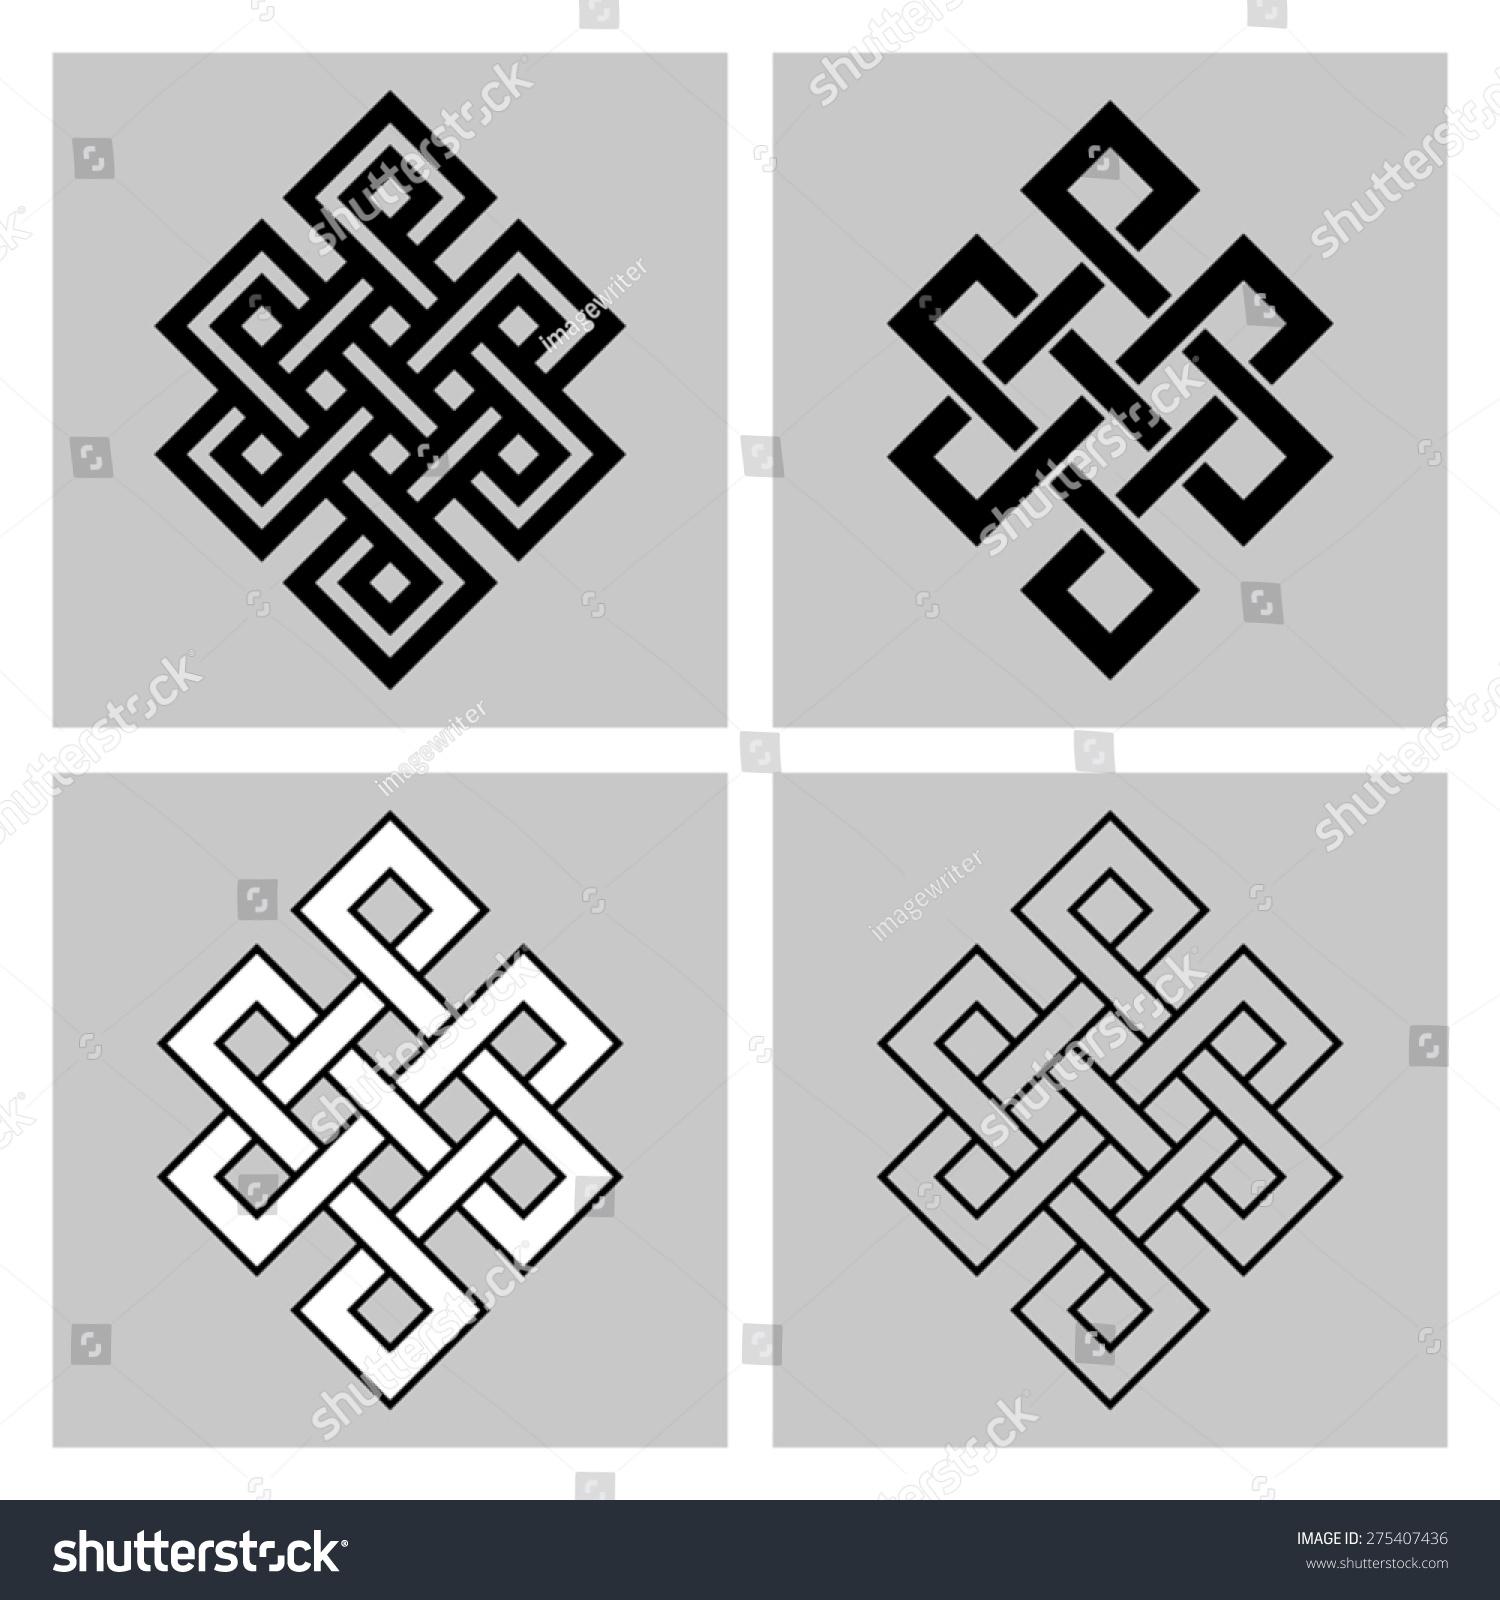 Endless Knot Sacred Symbol Rebirths Concatenation Stock Vector